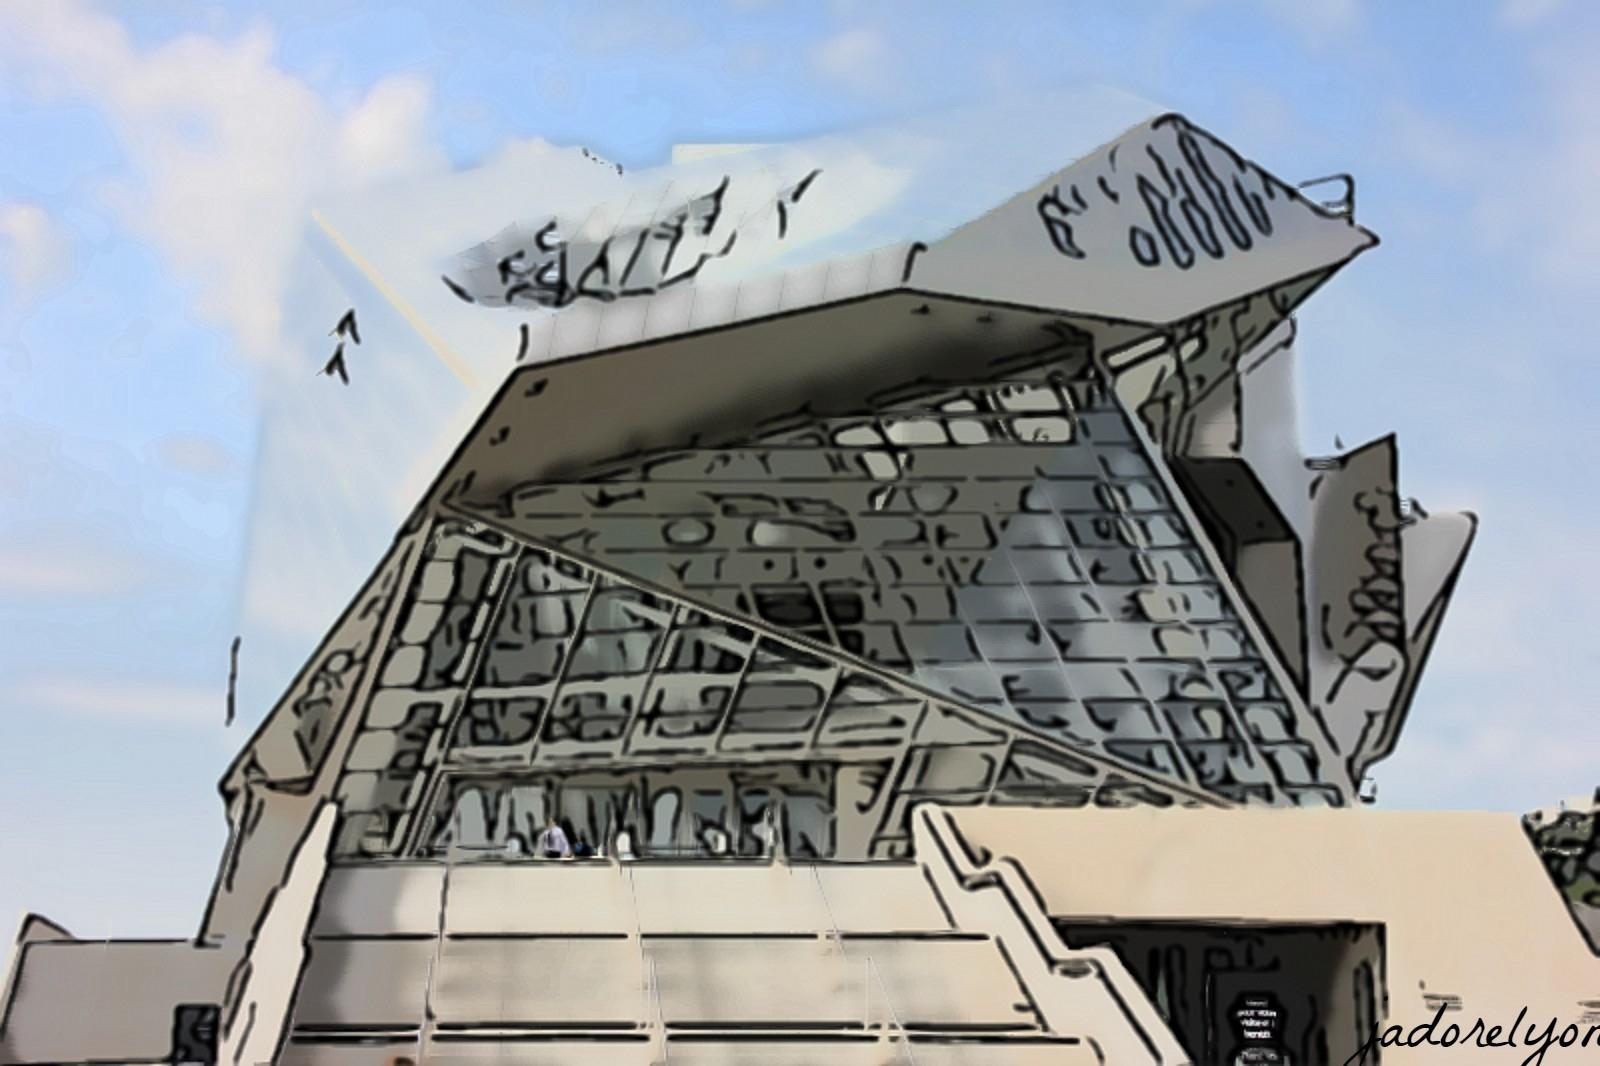 4.Musee des Confluences